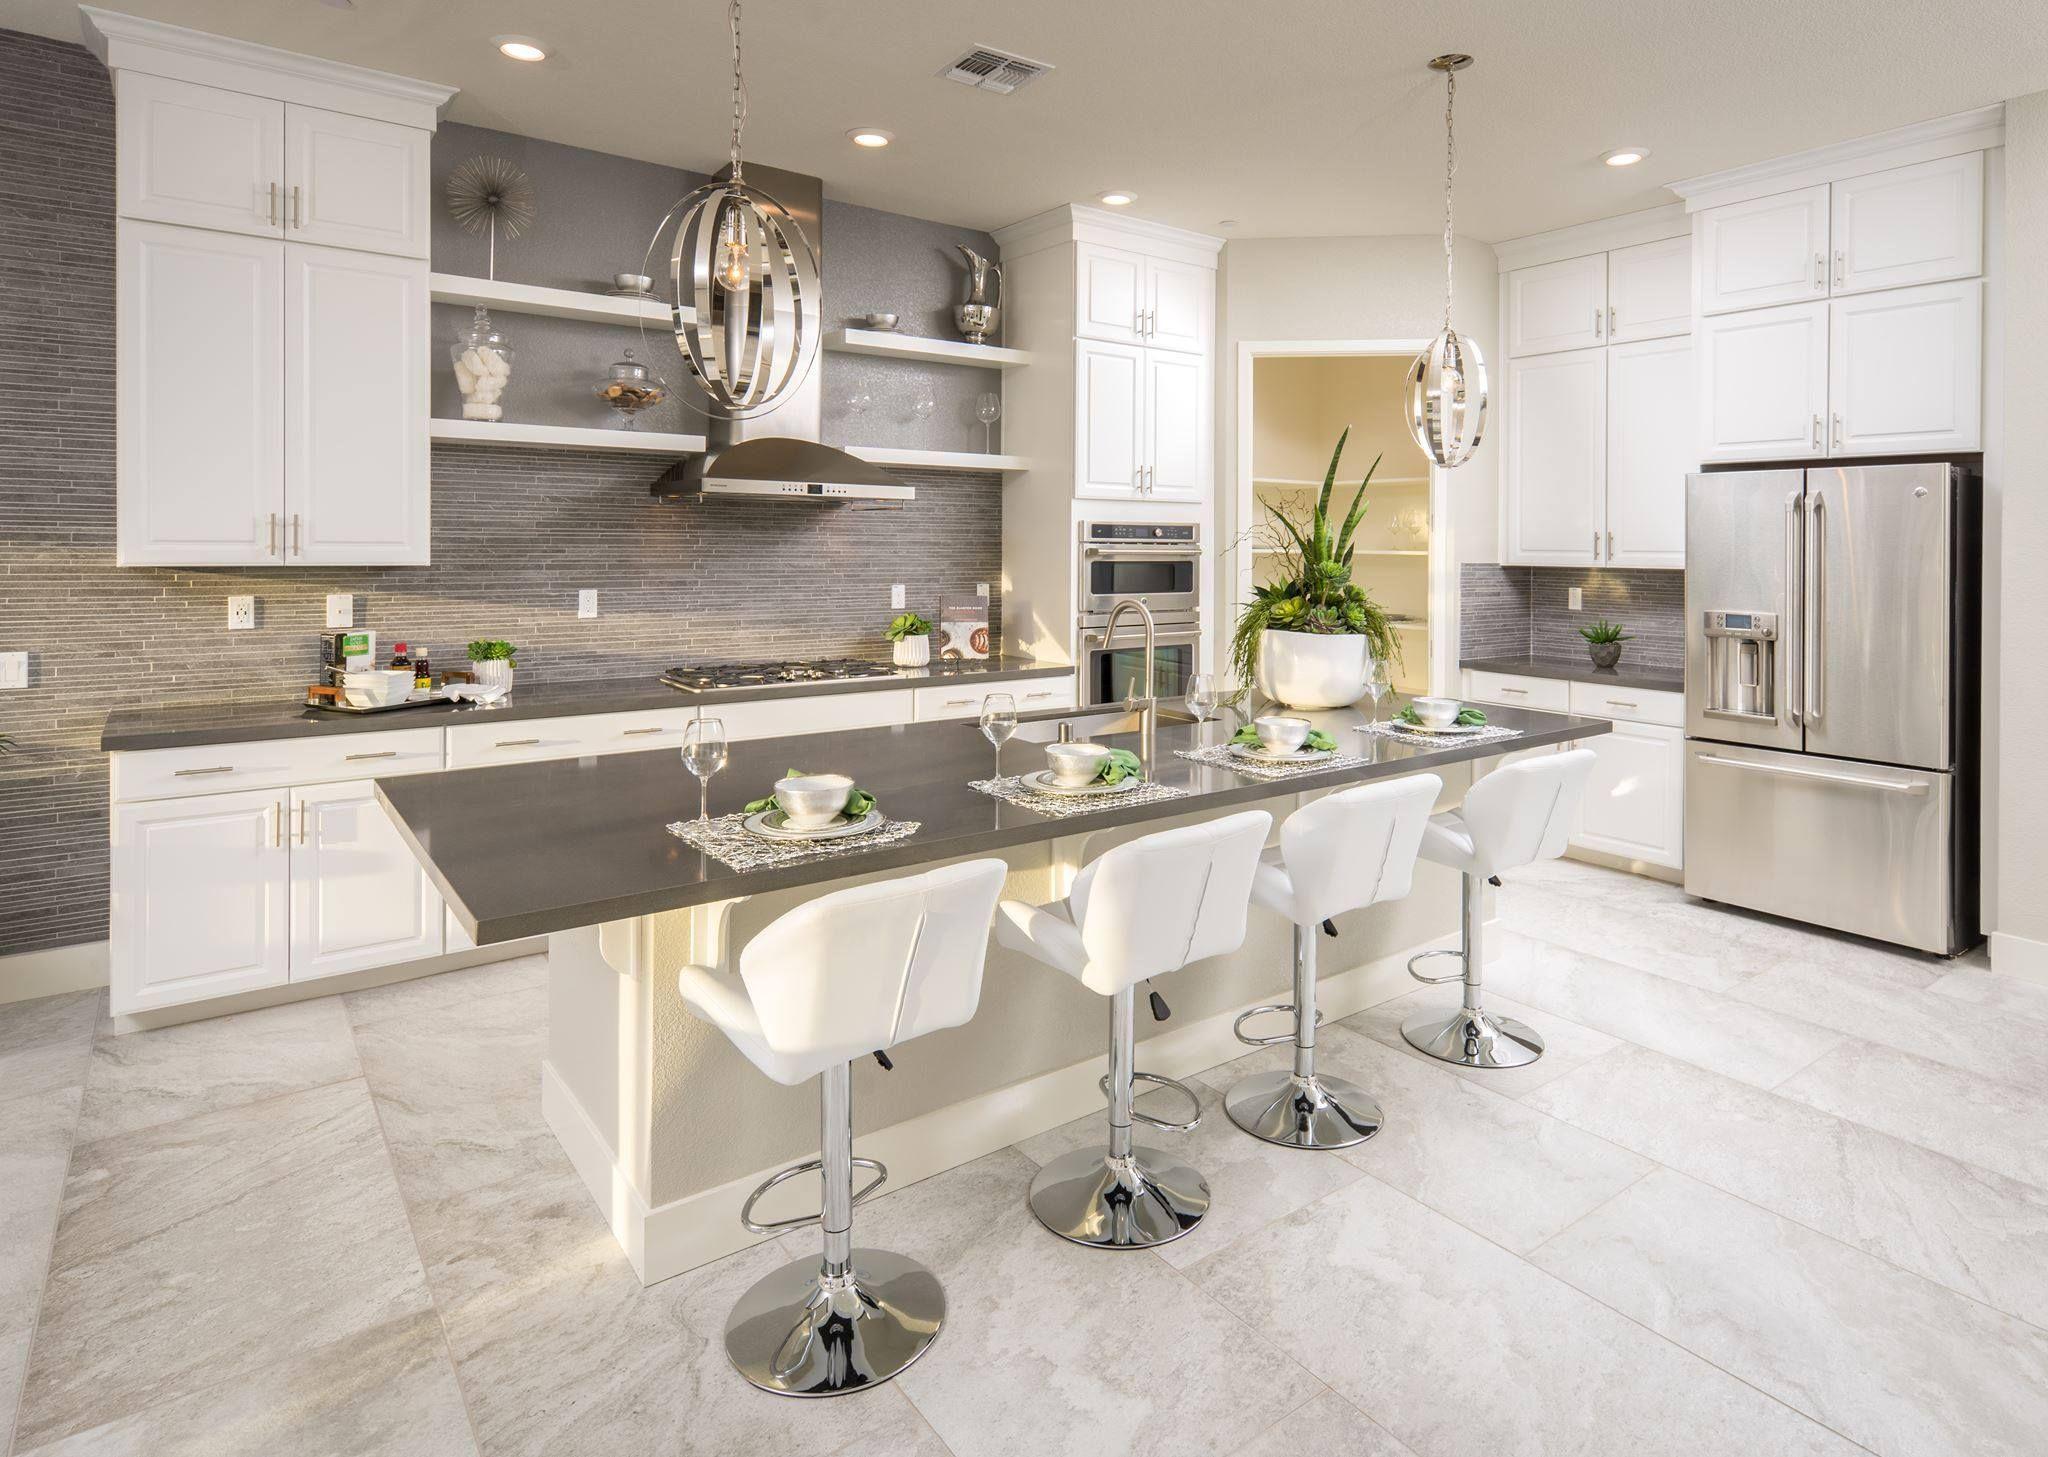 What Is Your Favorite Feature In This Kitchen California Newhomes Kitchen Dreamkitchen Design St Contemporary Kitchen Home Decor Kitchen Kitchen Design